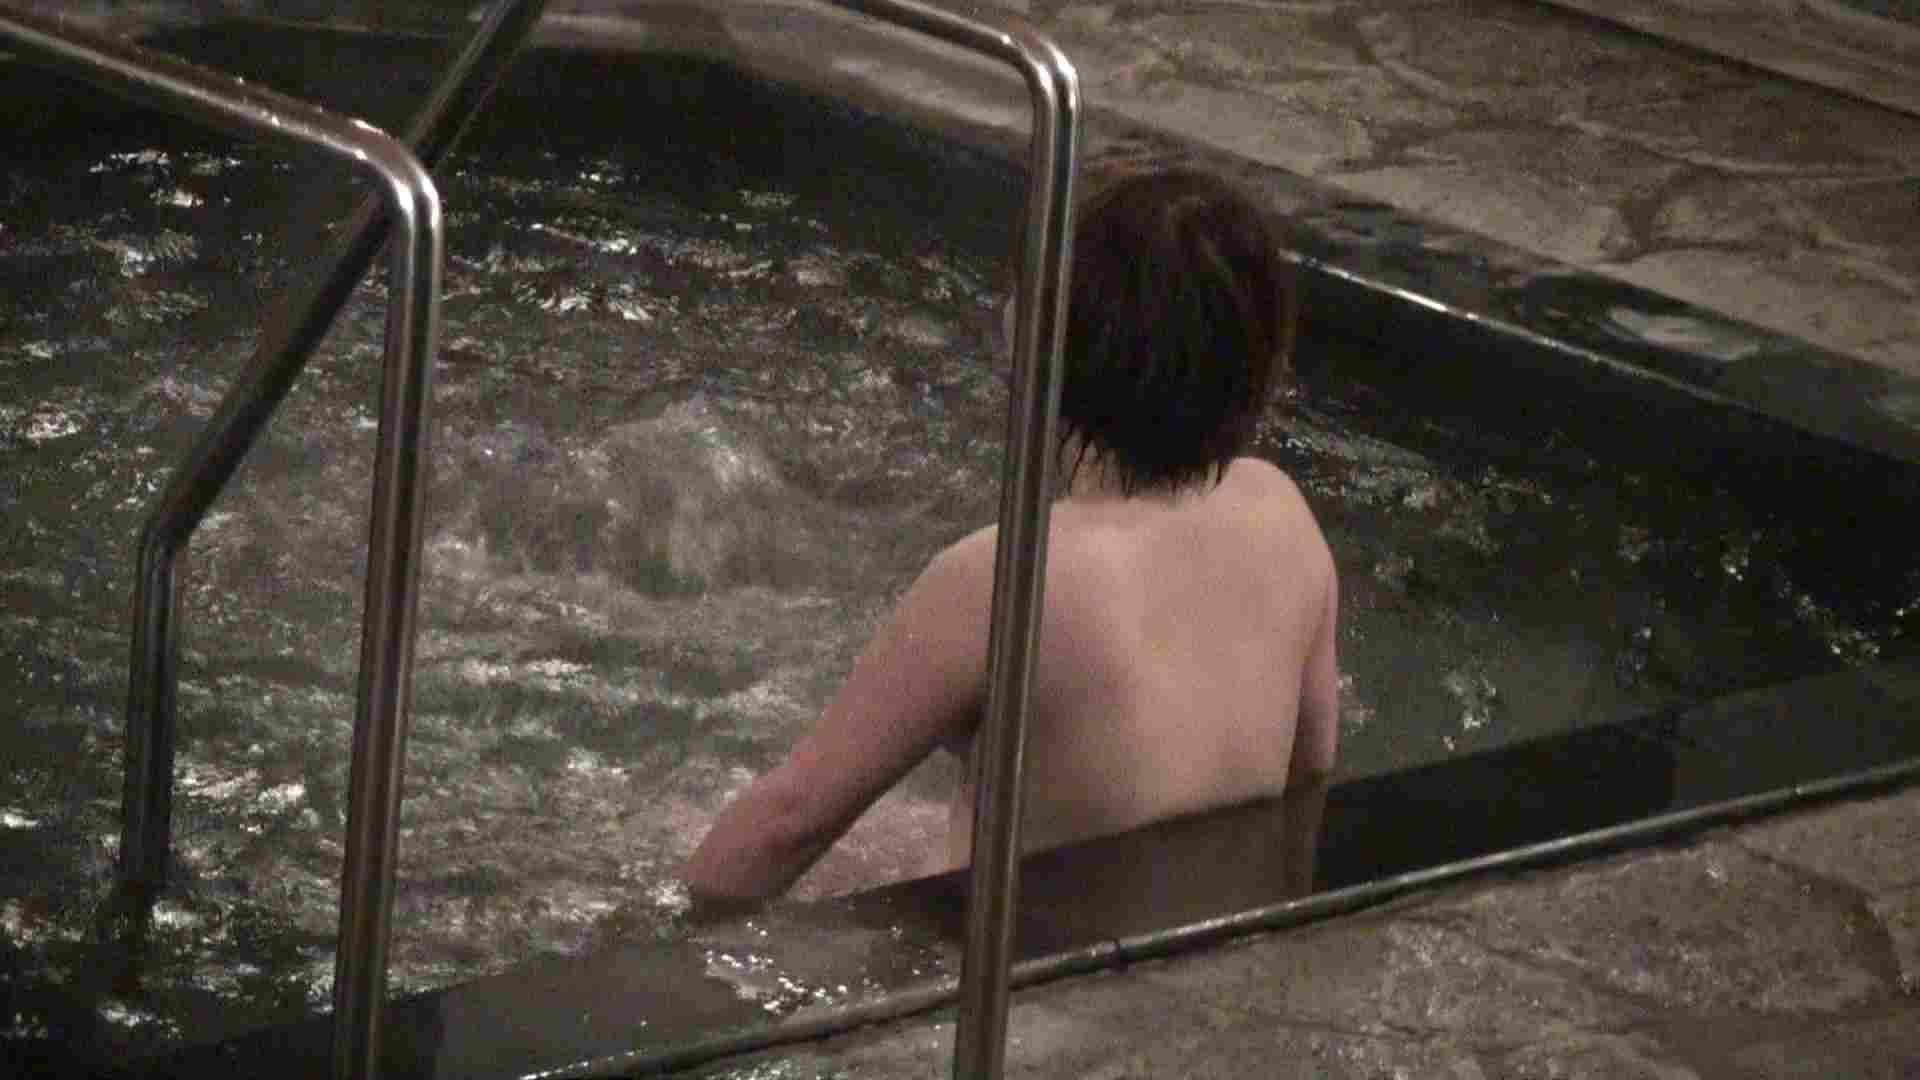 Aquaな露天風呂Vol.432 HなOL AV無料動画キャプチャ 111pic 62